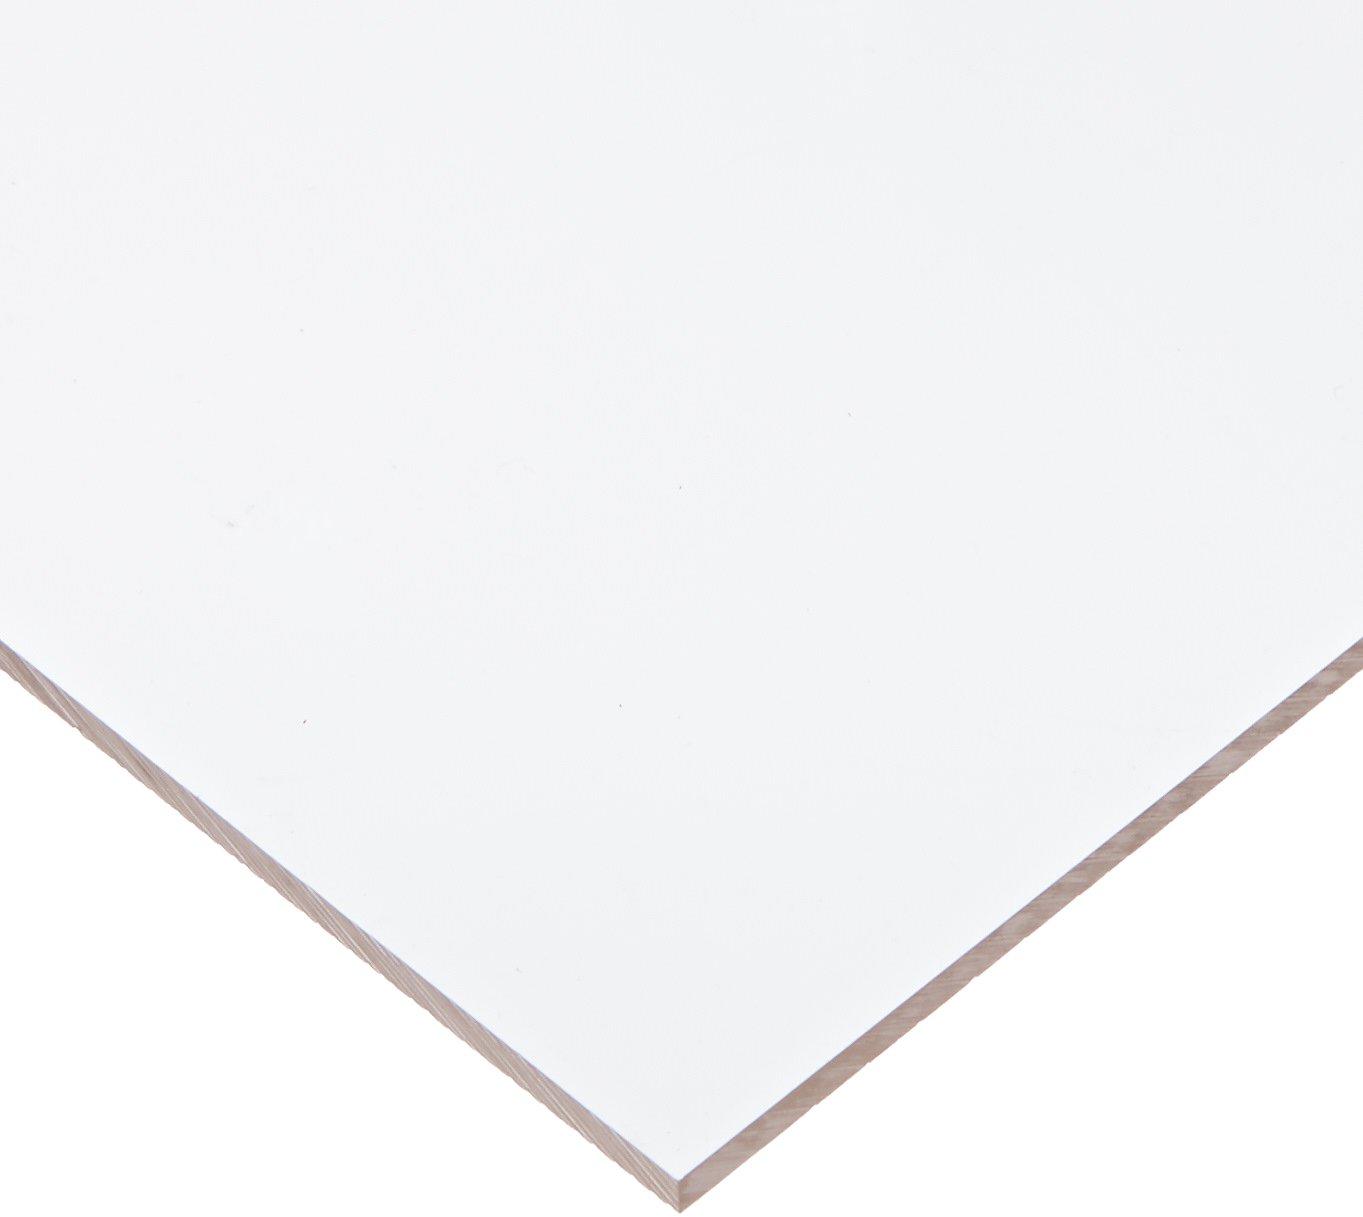 Small Parts Cast Acrylic Sheet Image 1